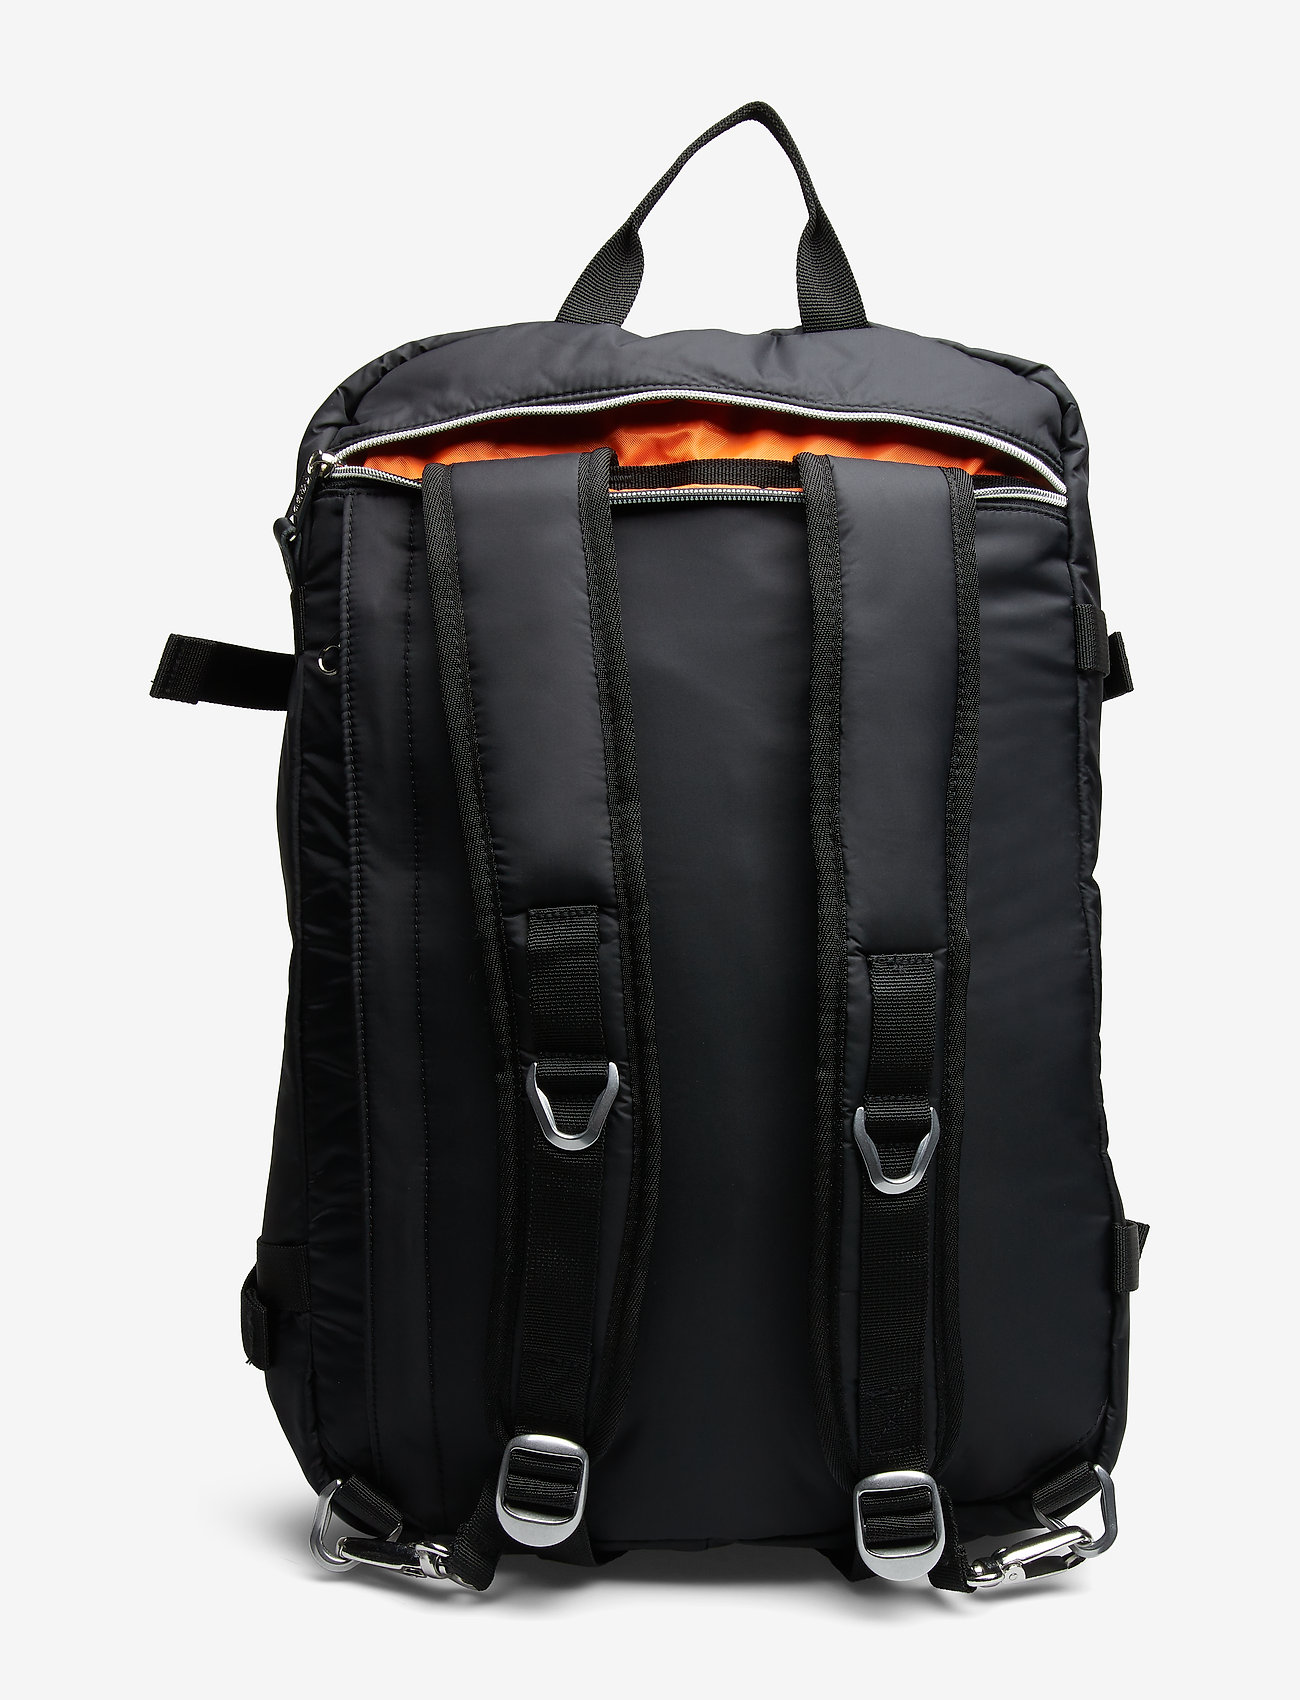 Eastpak - TRAWEL - sacs a dos - tailored black - 1